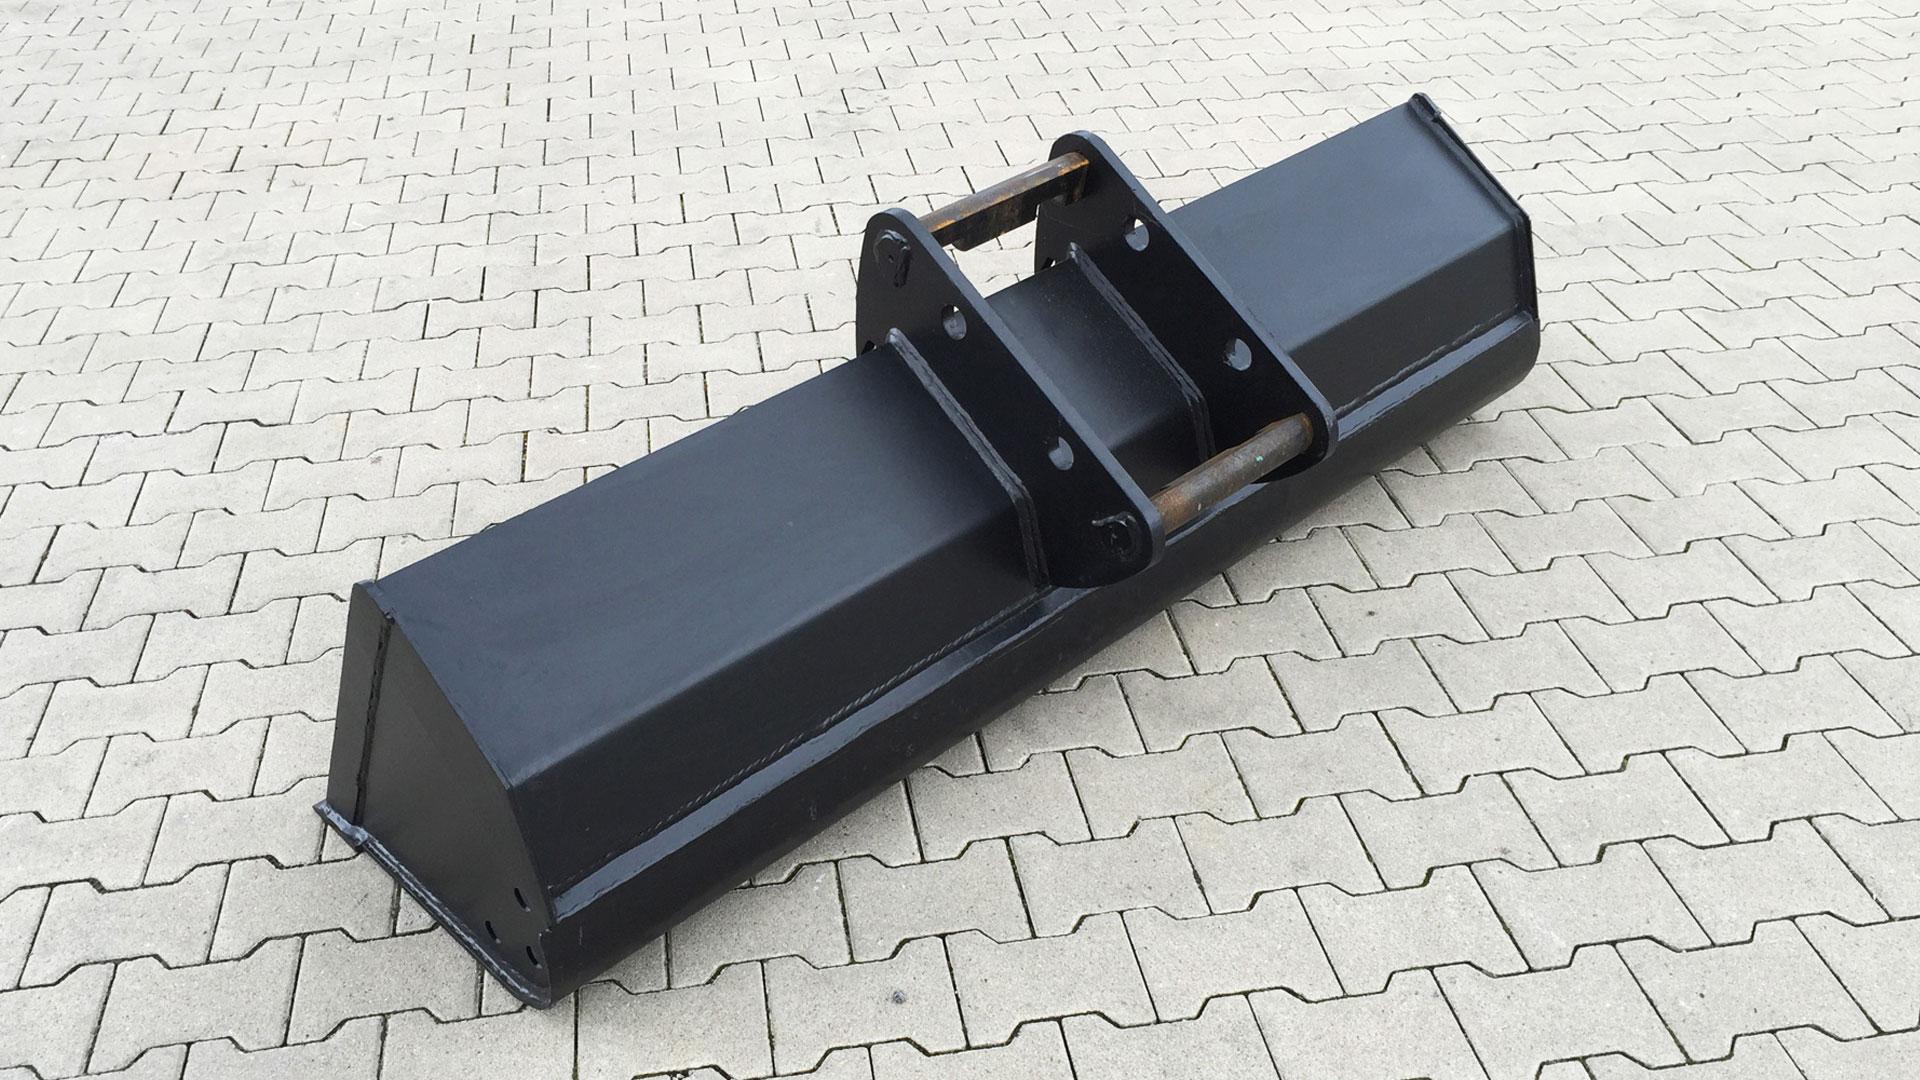 grabenraumlöffel-MS08-SY-1800mm-2